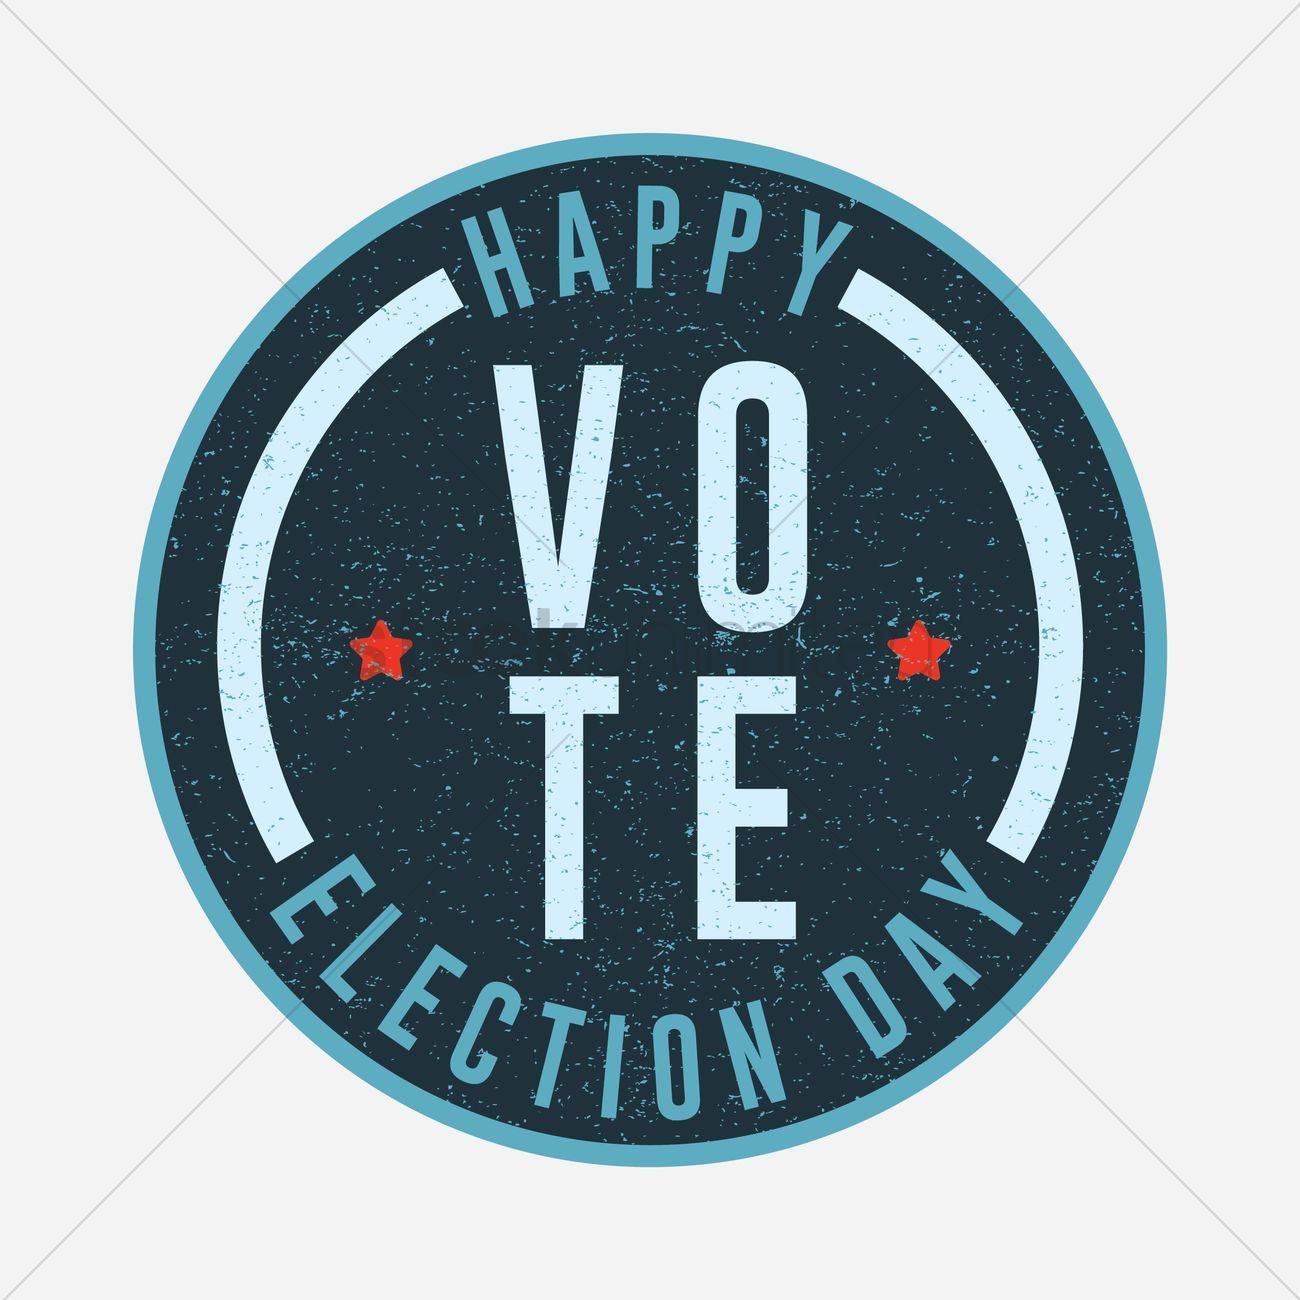 Election Vote Badge Vector Illustration Ad Vote Election Badge Illustration Vector Affiliate Merchandise Design Design Clip Art